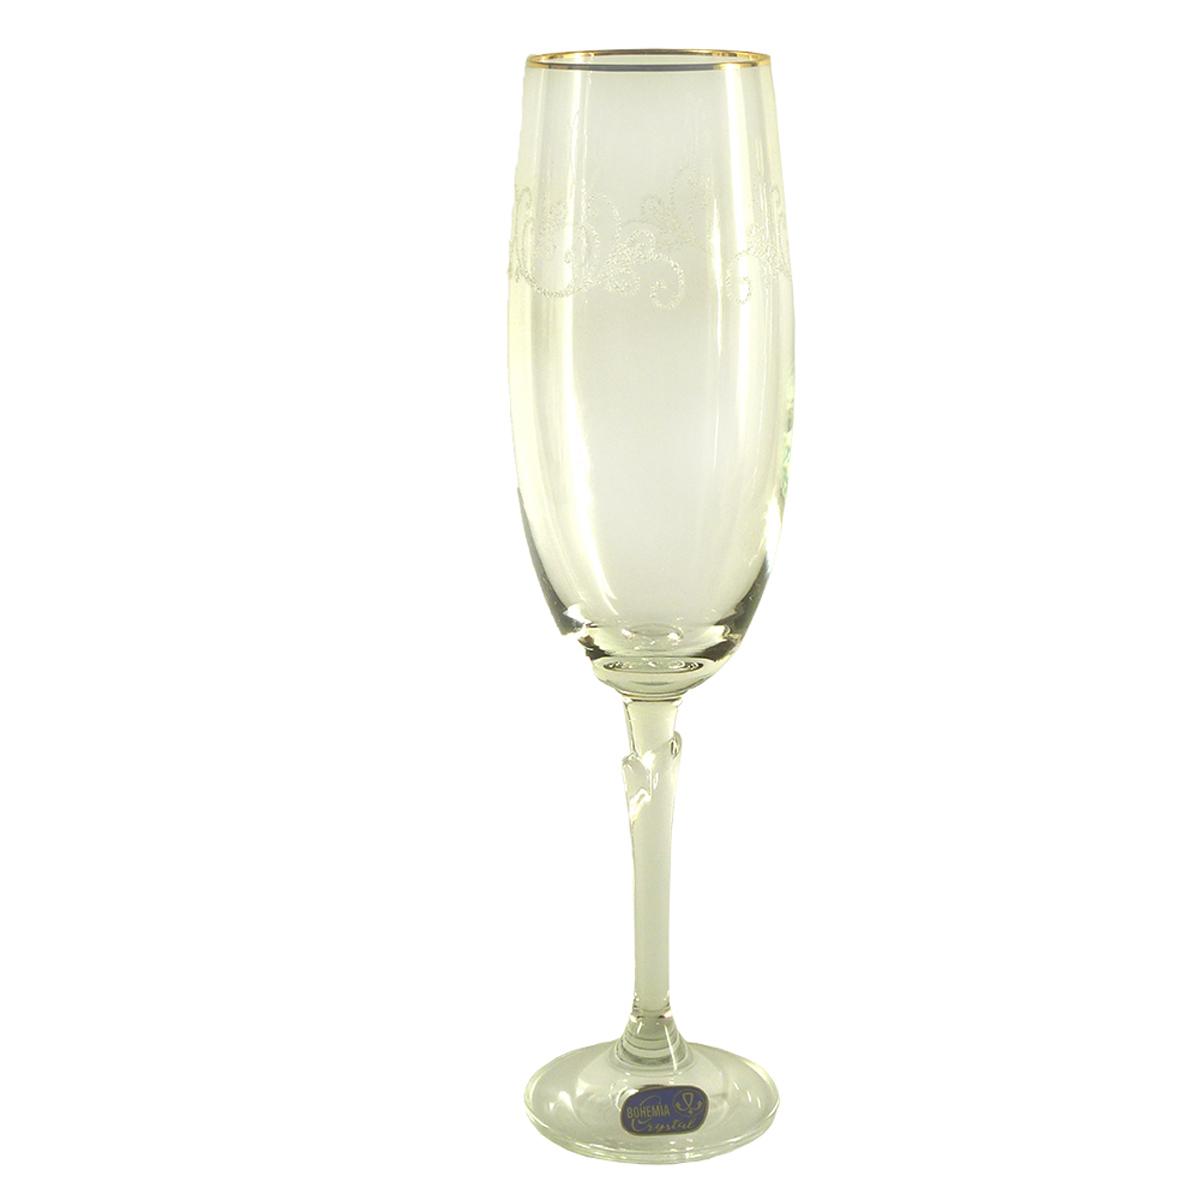 Набор бокалов для шампанского Bohemia Crystal Бриджитта, 190 мл, 6 шт. 40303/387507/190 bohemia crystal набор бокалов для шампанского felina 25 см 2 шт